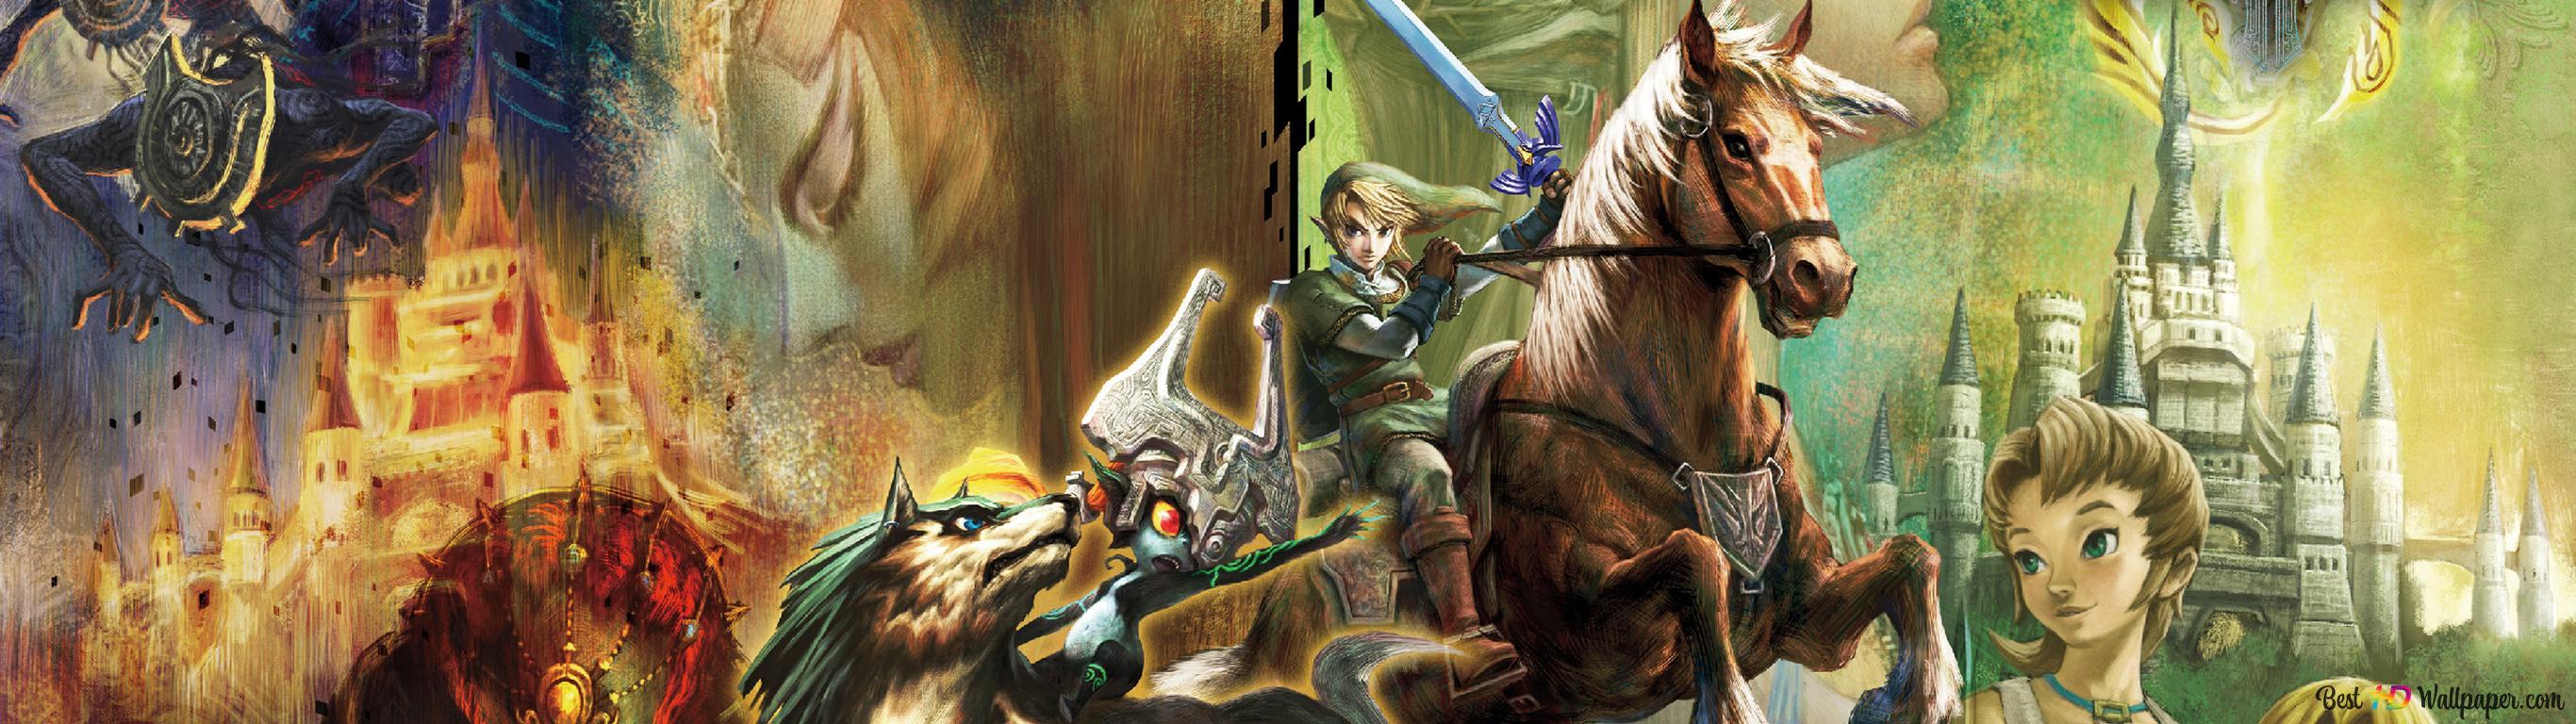 The Legend Of Zelda Twilight Princess Hd Wallpaper Download